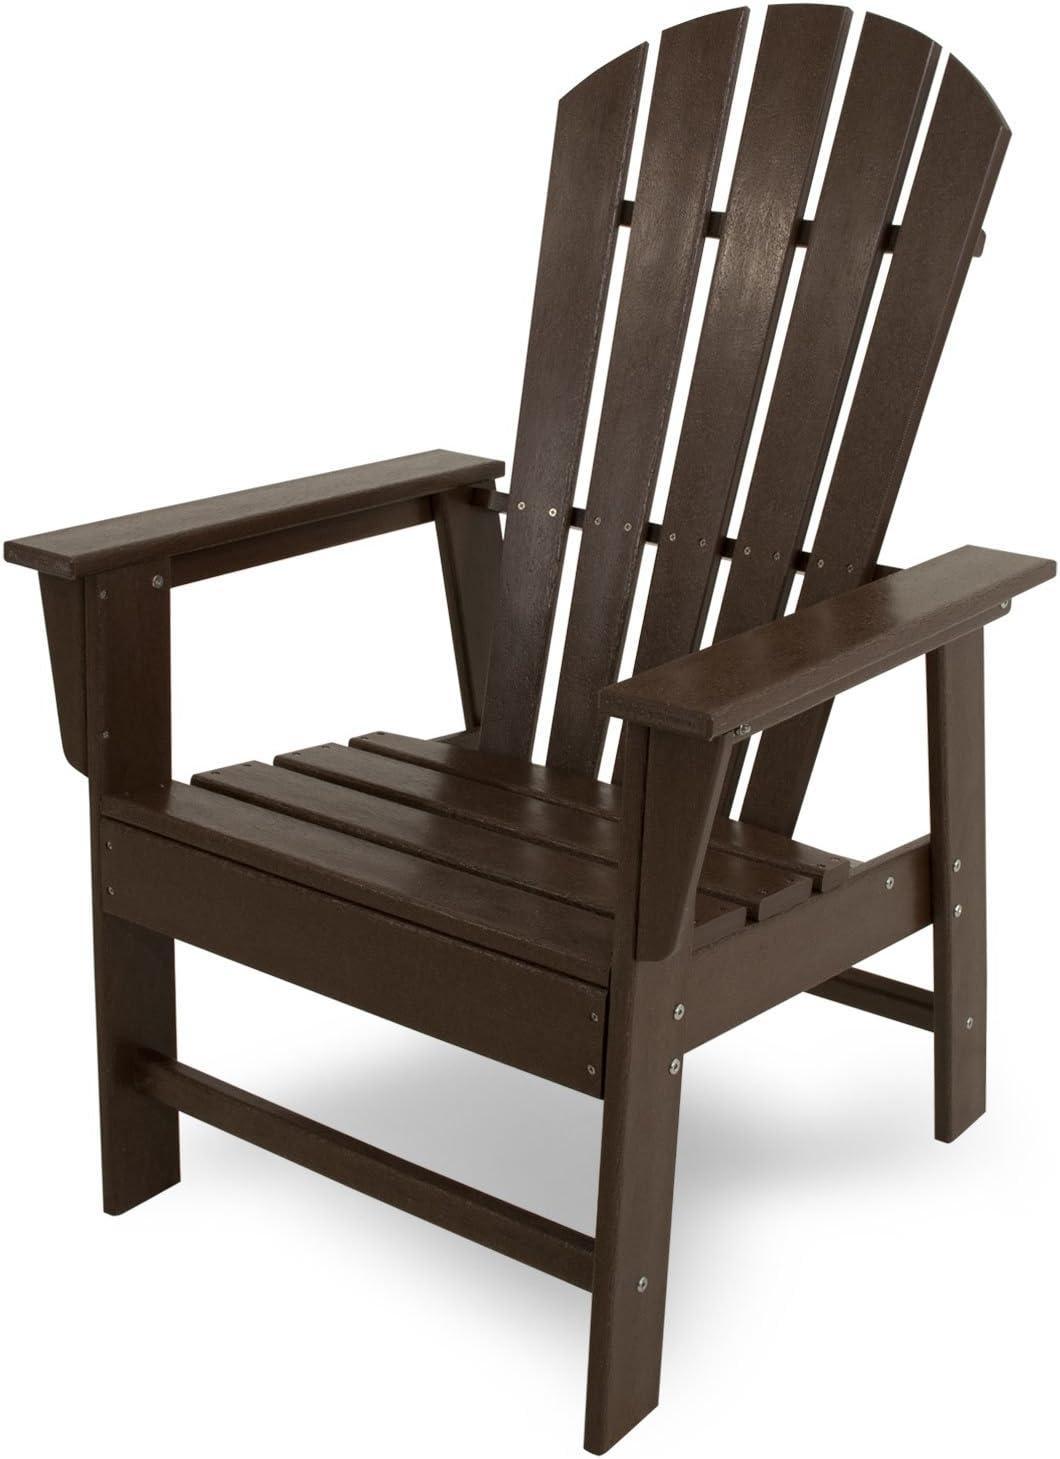 POLYWOOD SBD16MA South Beach Dining Chair, Mahogany